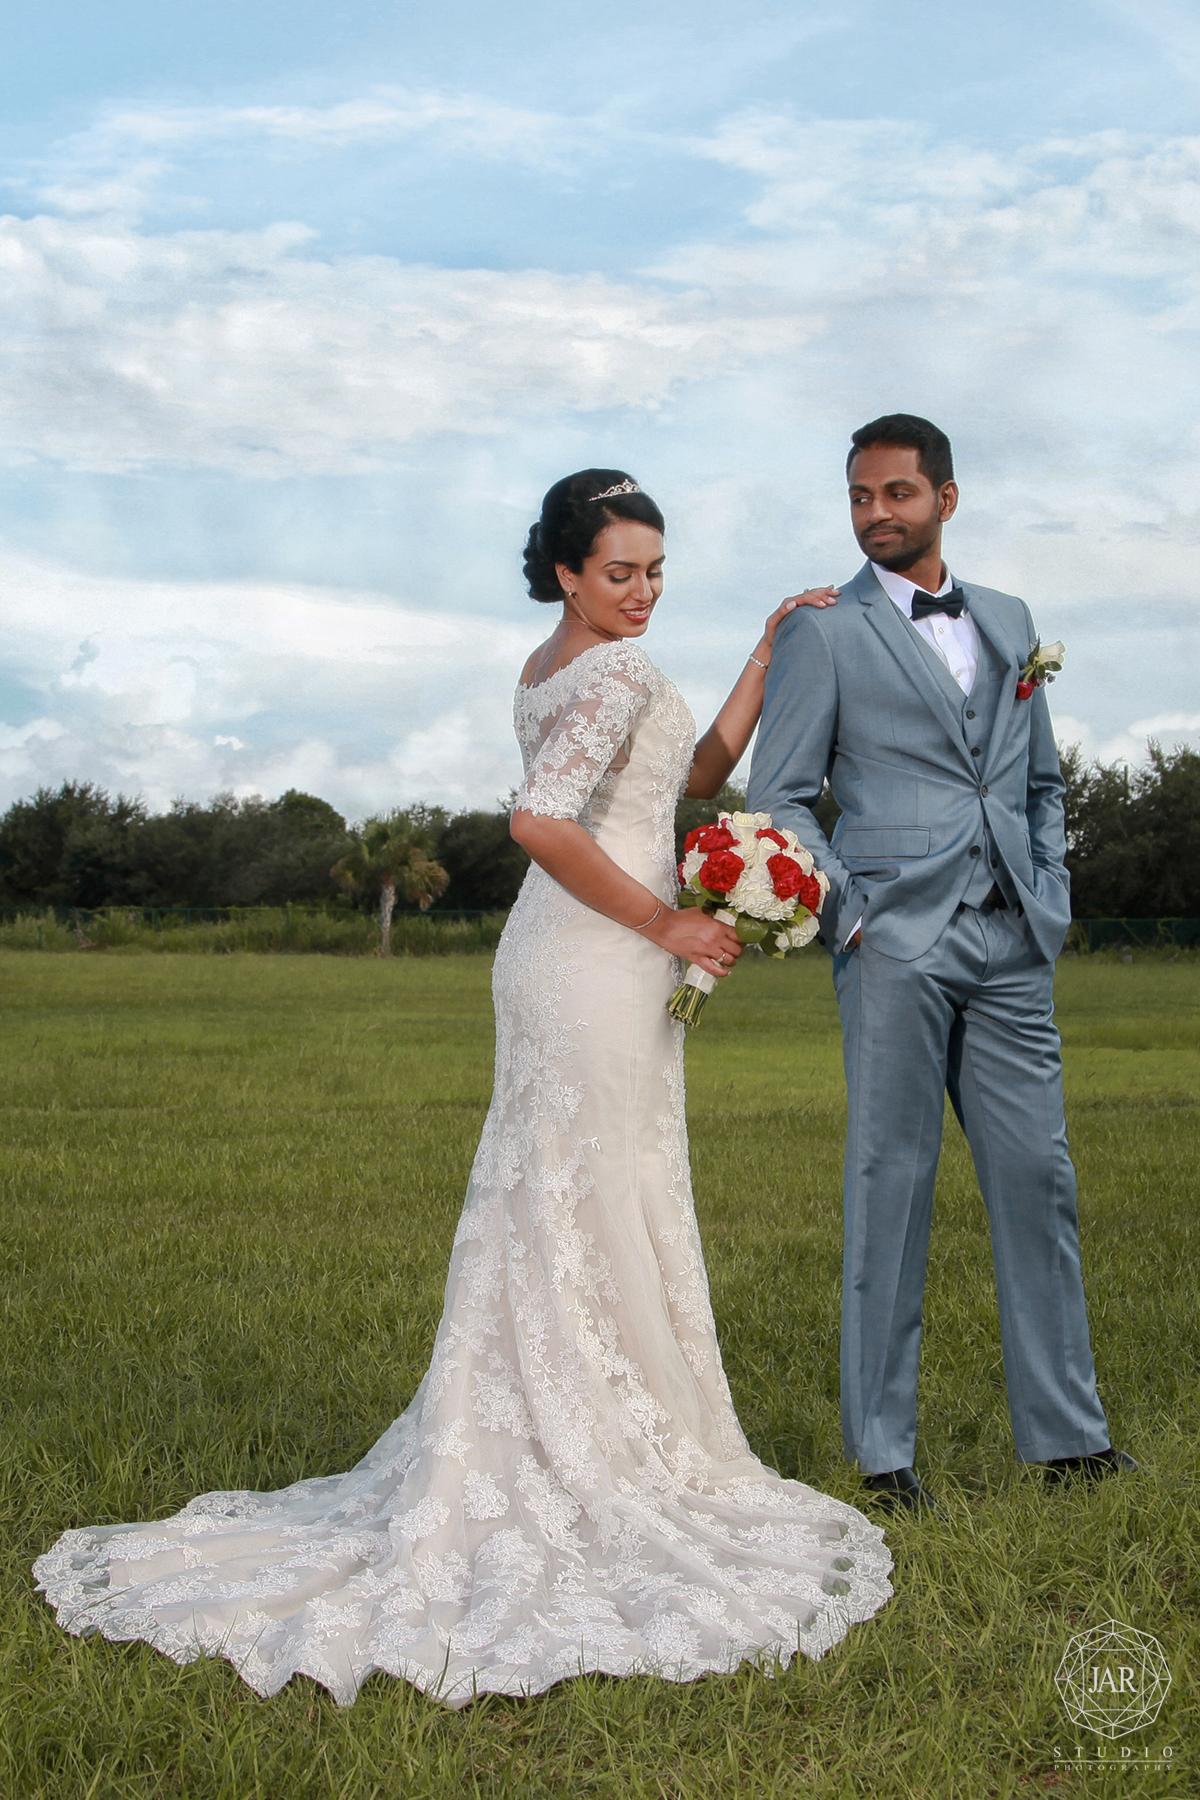 28-modern-wedding-trends-2017-beautiful-jarstudio-photography.jpg